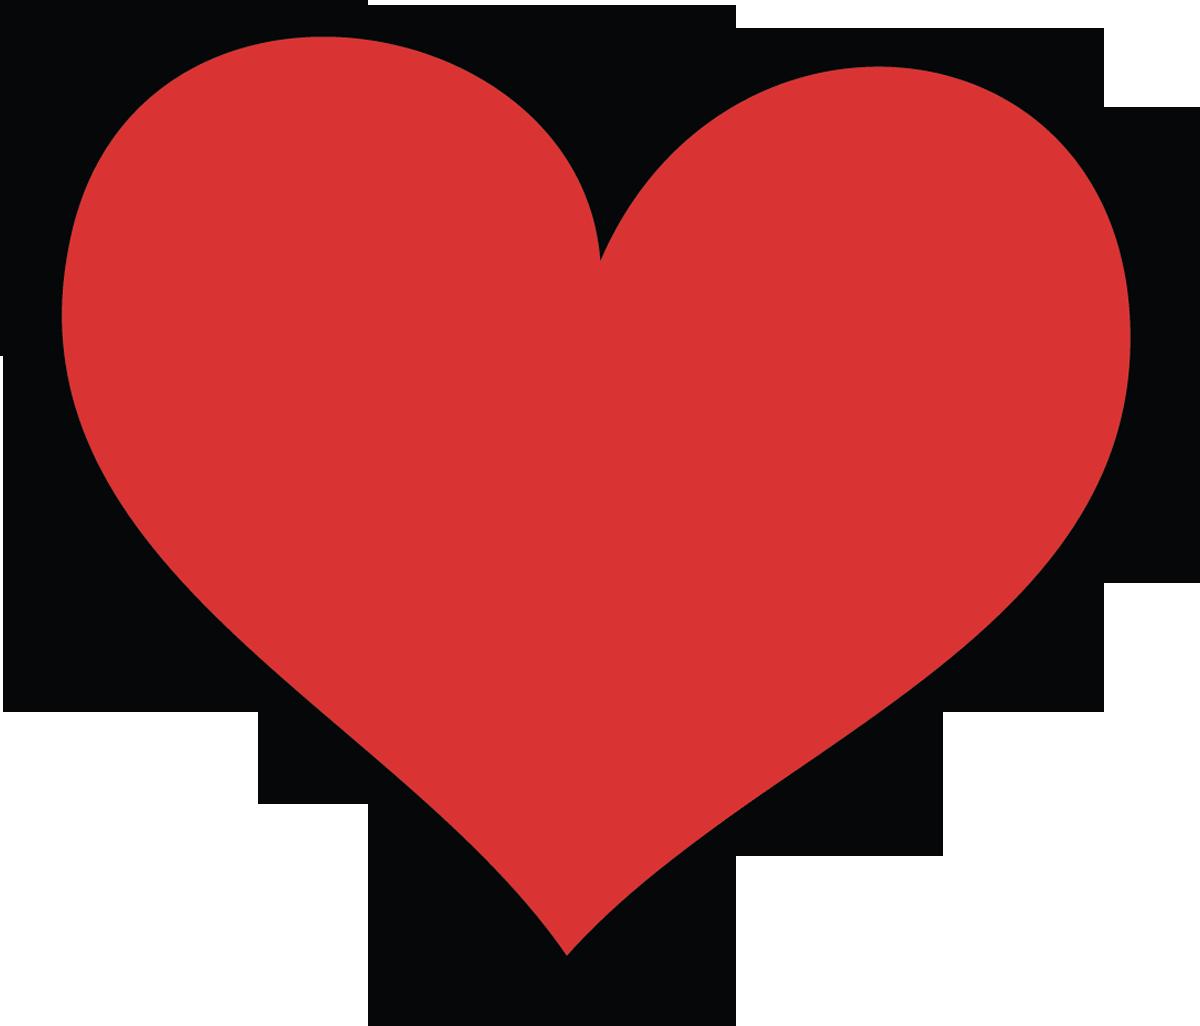 Love Hearts Clip Art 1 - Love Clipart PNG